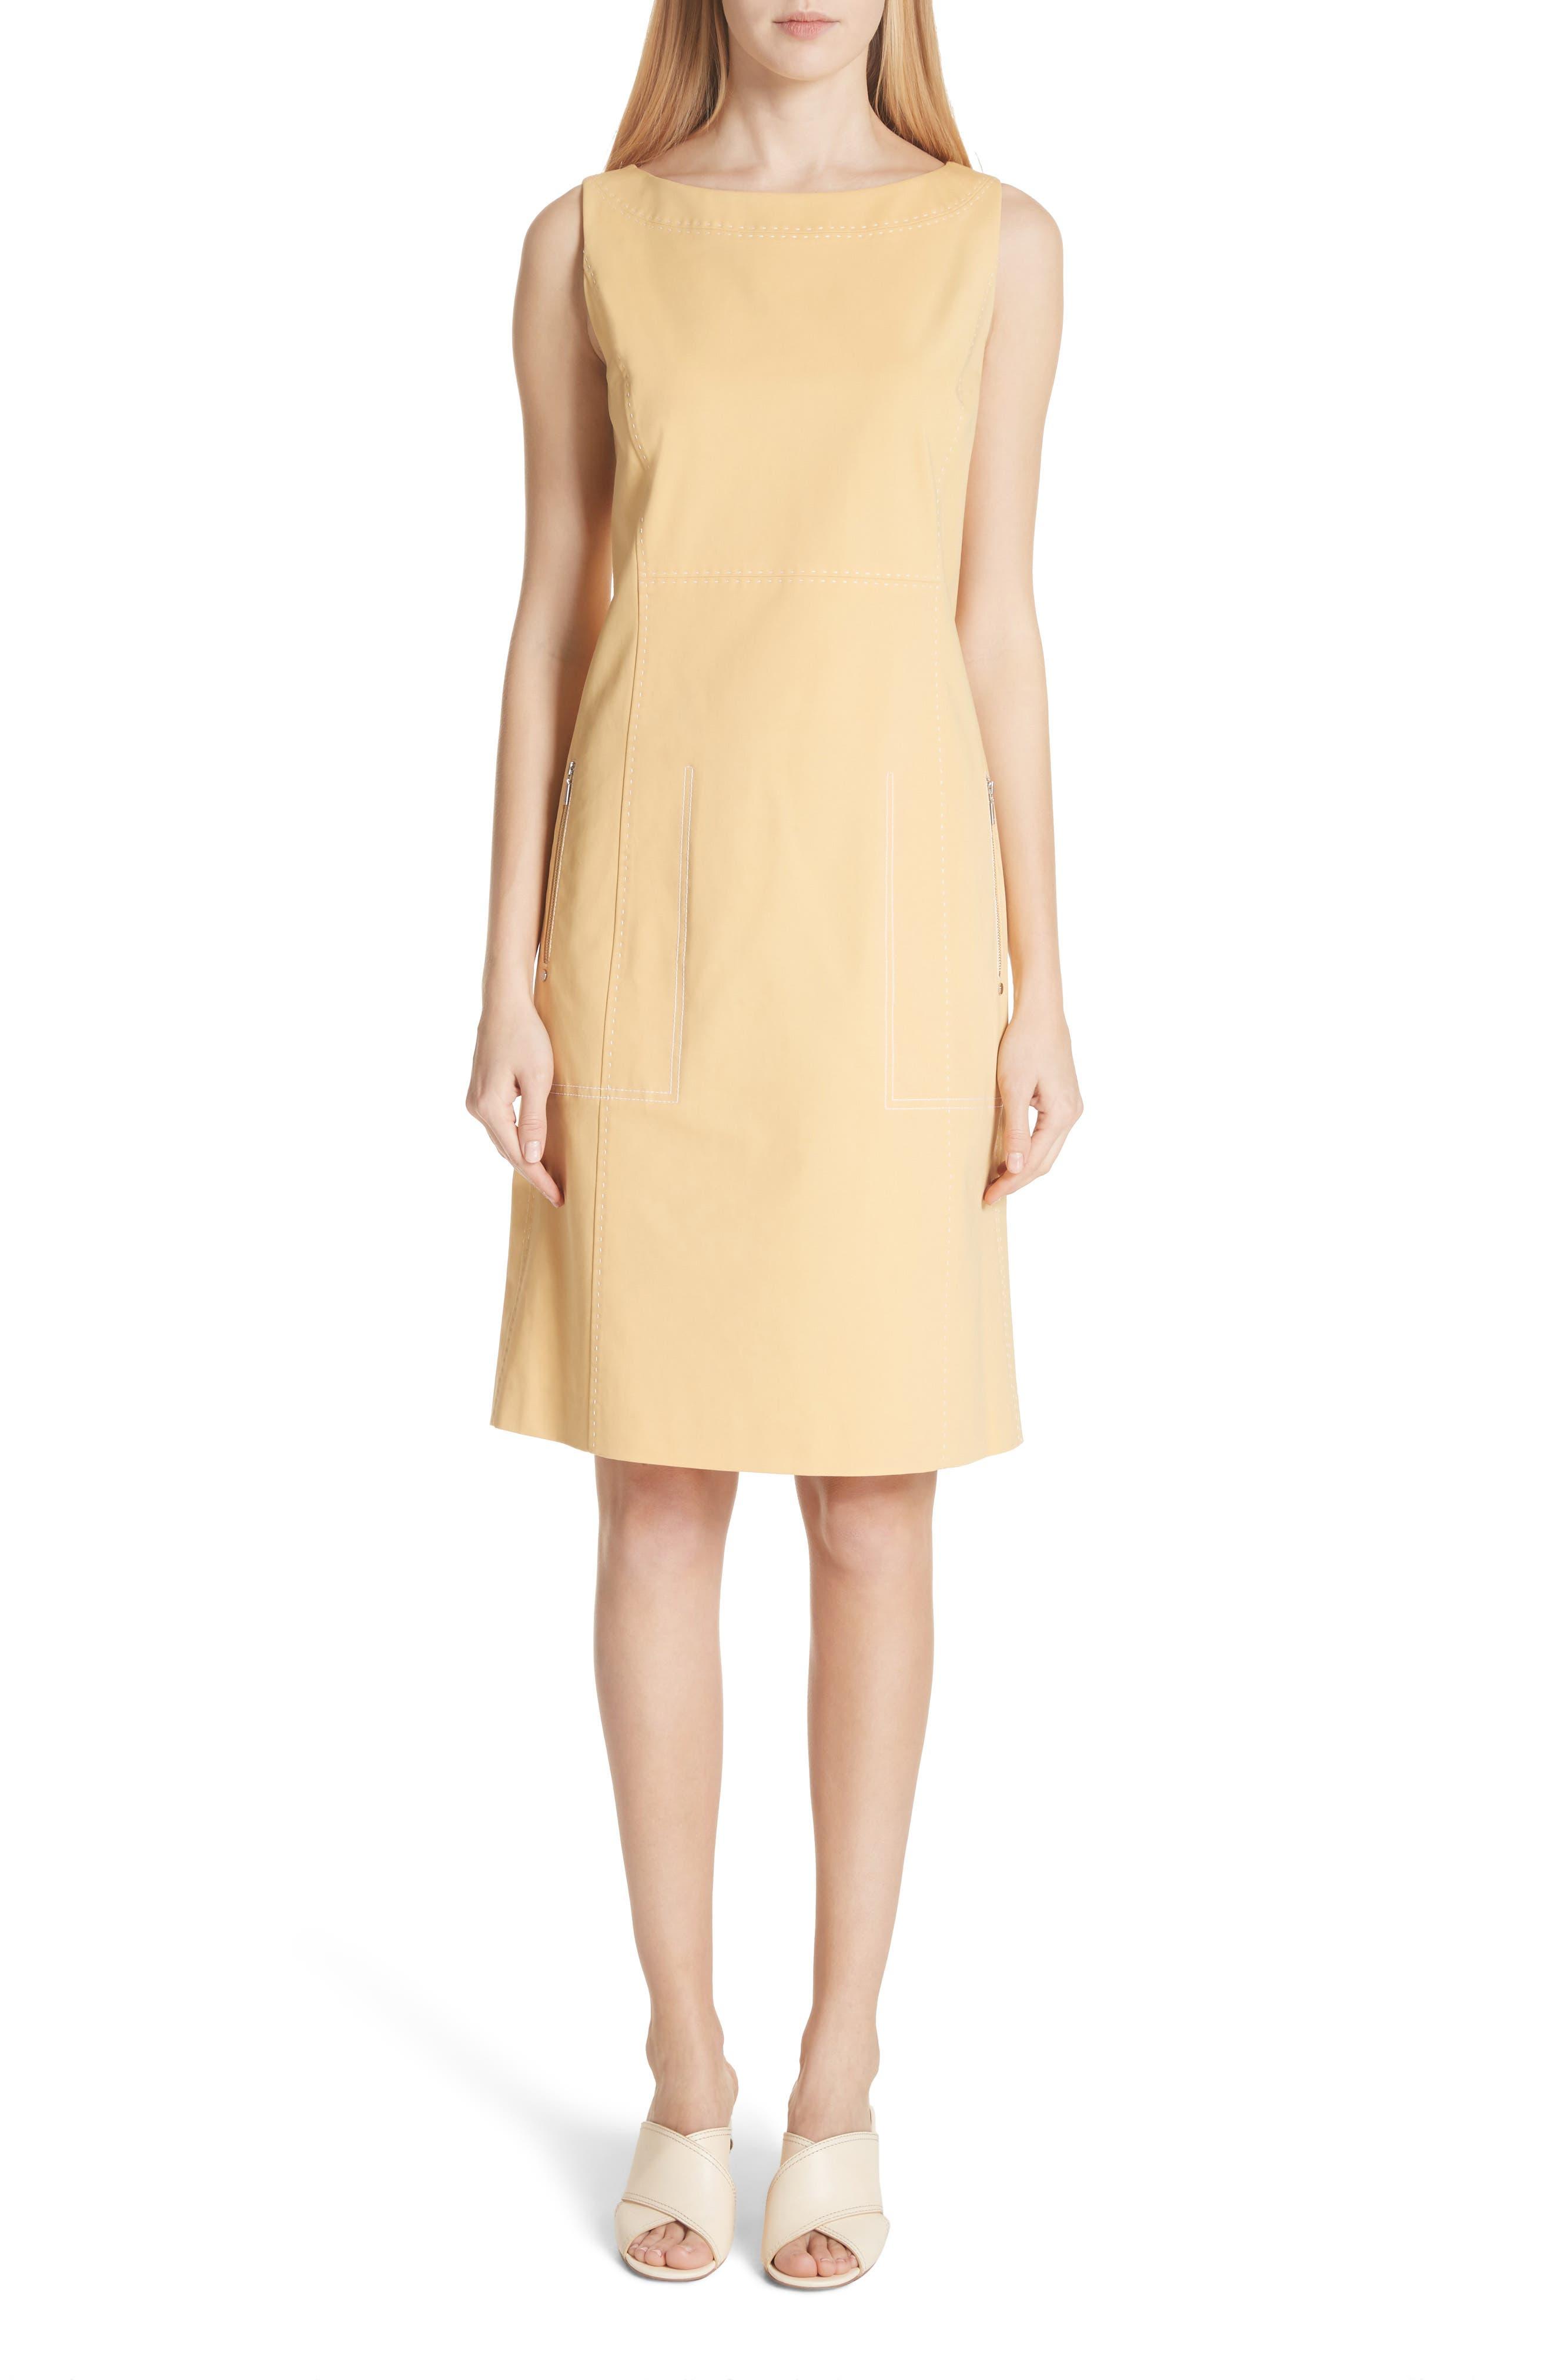 Paxton Sleeveless Sheath Dress,                             Main thumbnail 1, color,                             Sienna Yellow